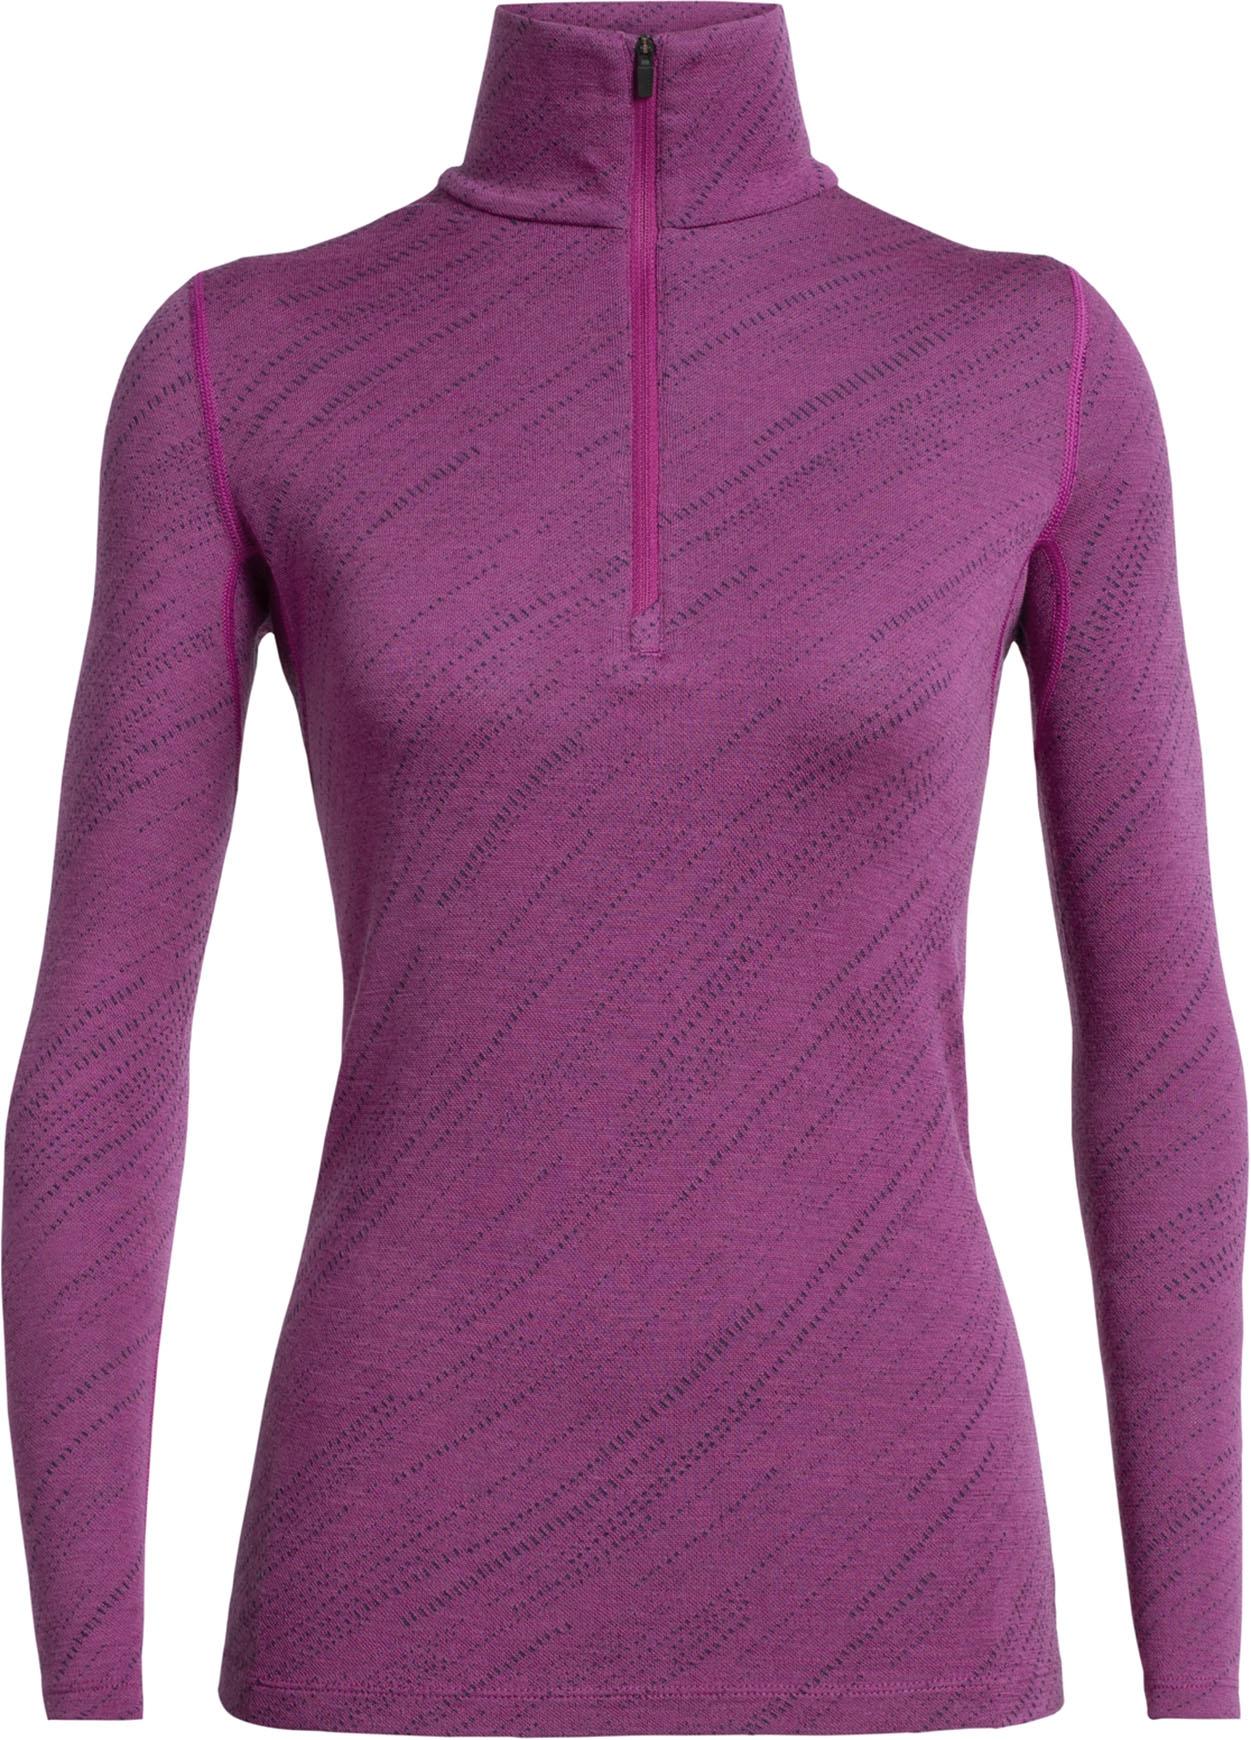 Snow Storm Thermo Unterw/äsche Women Icebreaker 250 Vertex Longsleeve Half Zip Shirt